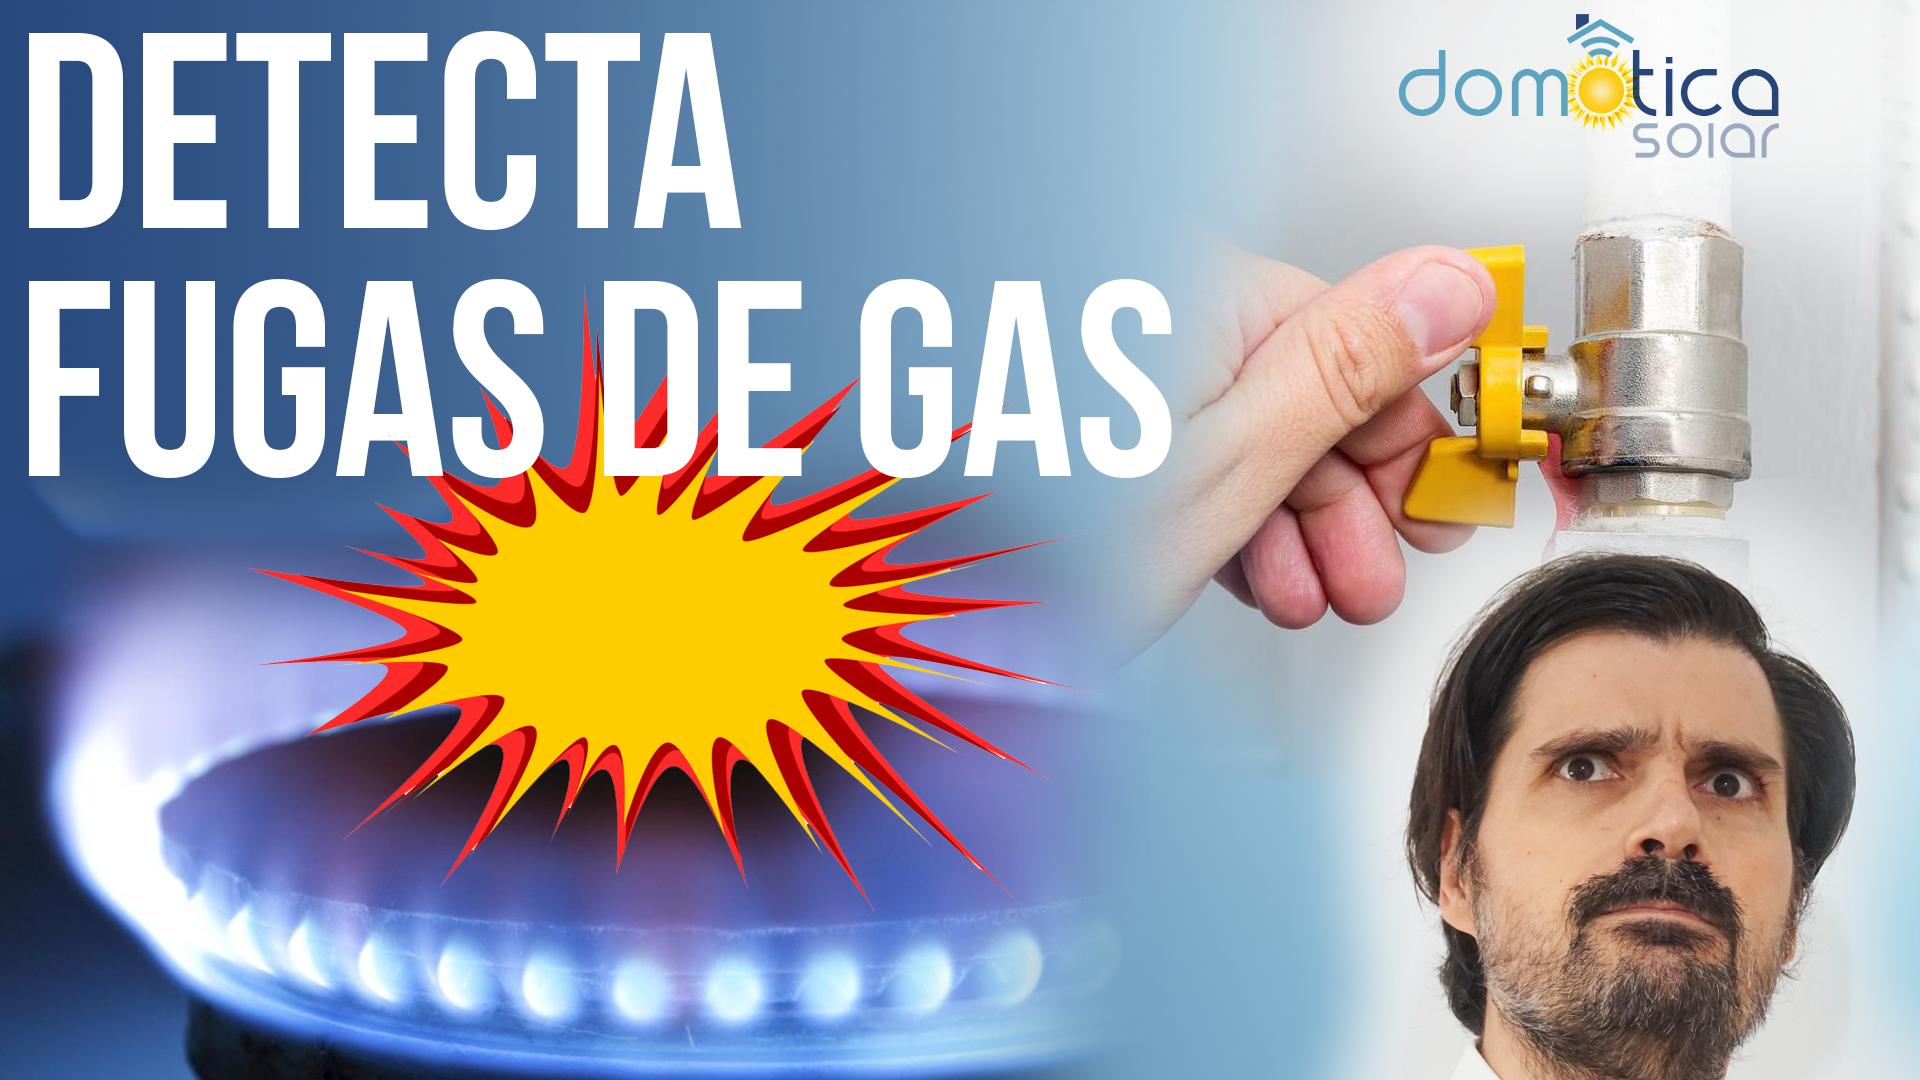 Domótica Solar - Detecta fugas de gas